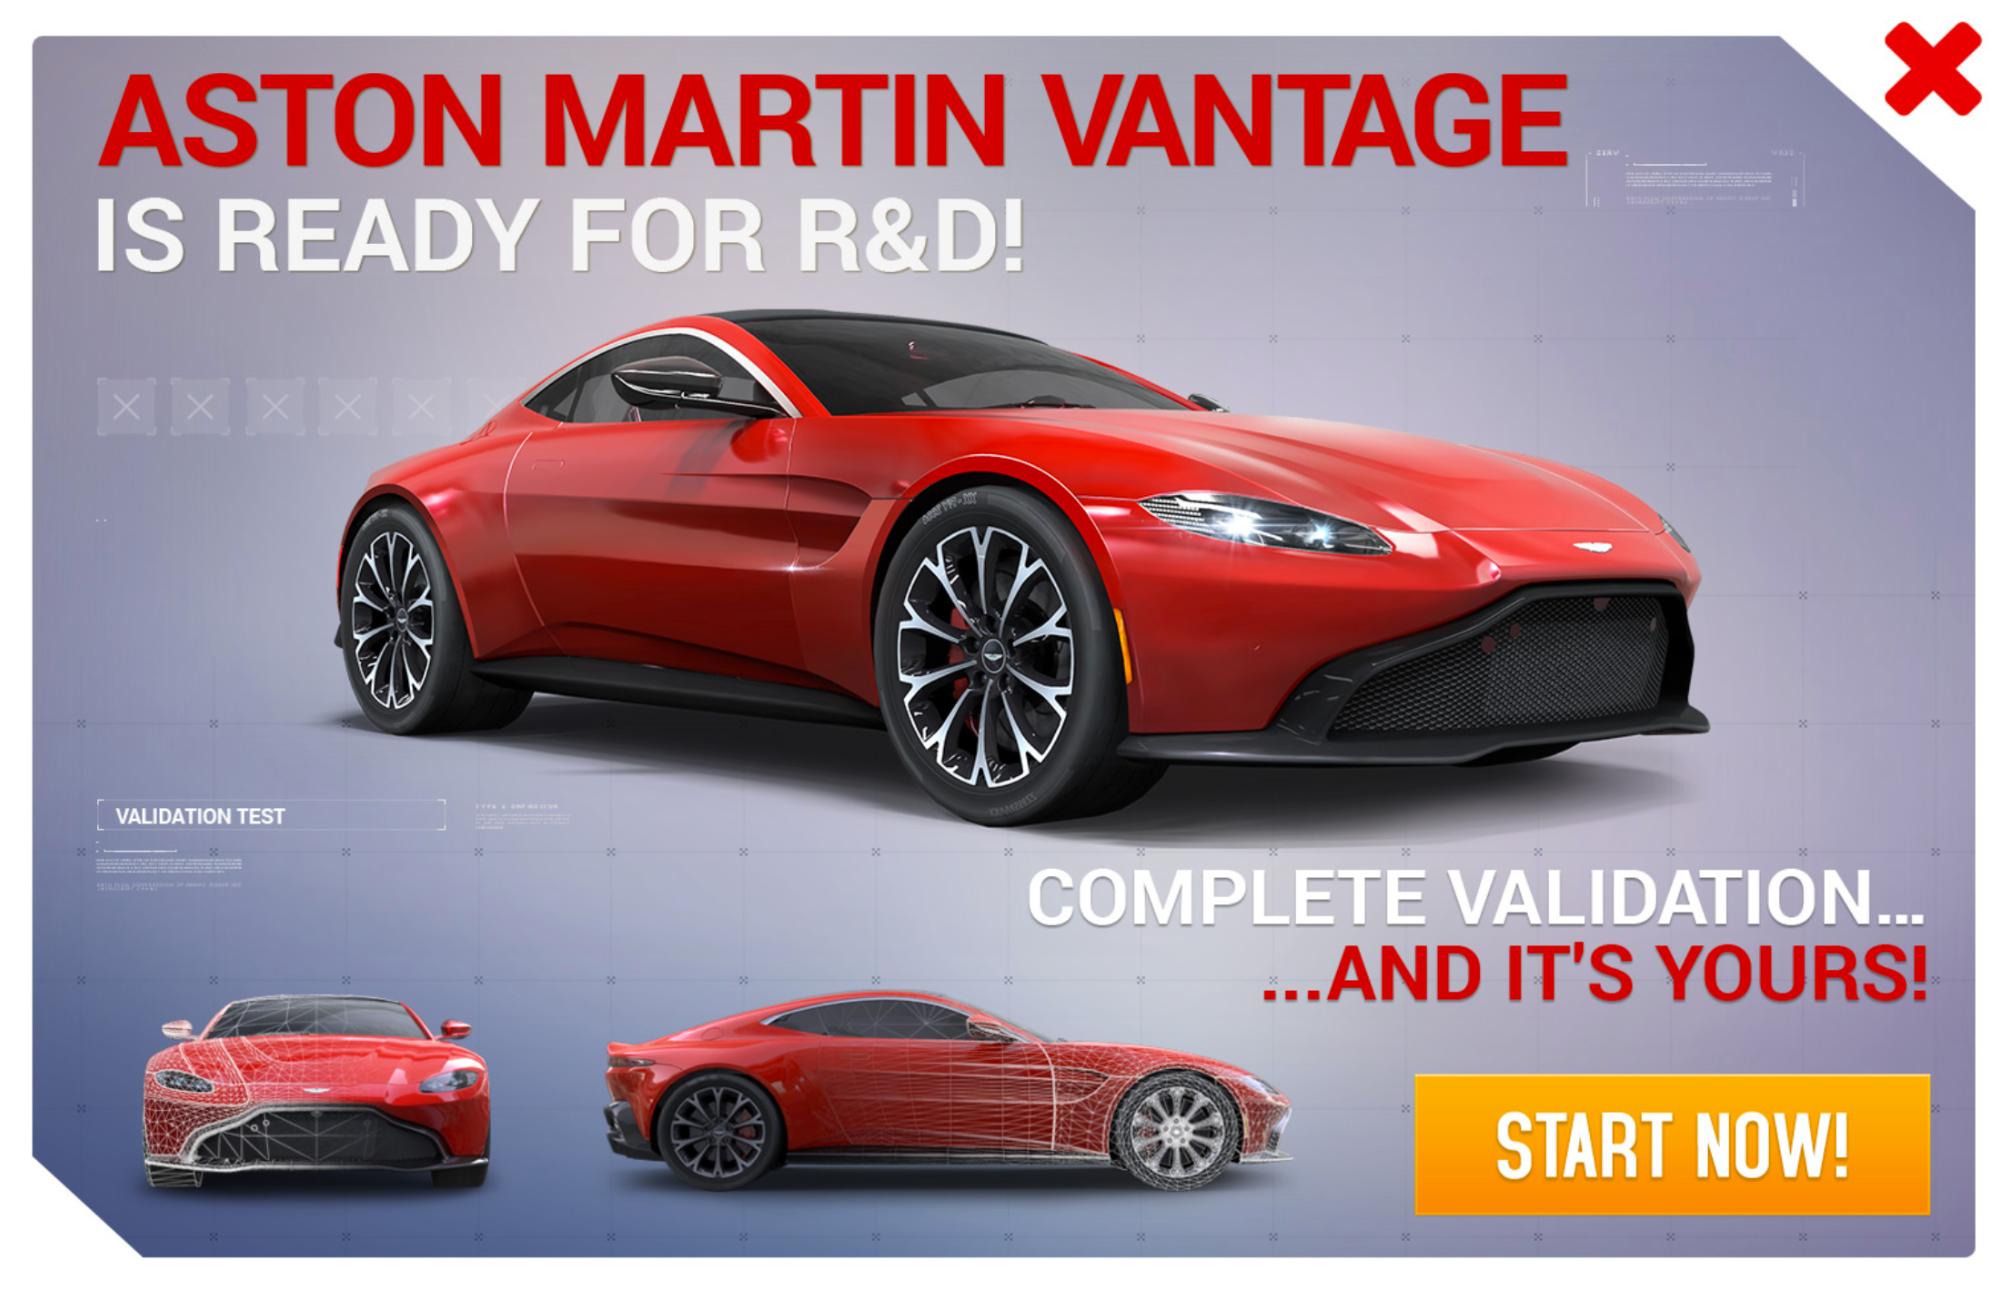 Aston Martin Vantage 2018 (Research & Development)